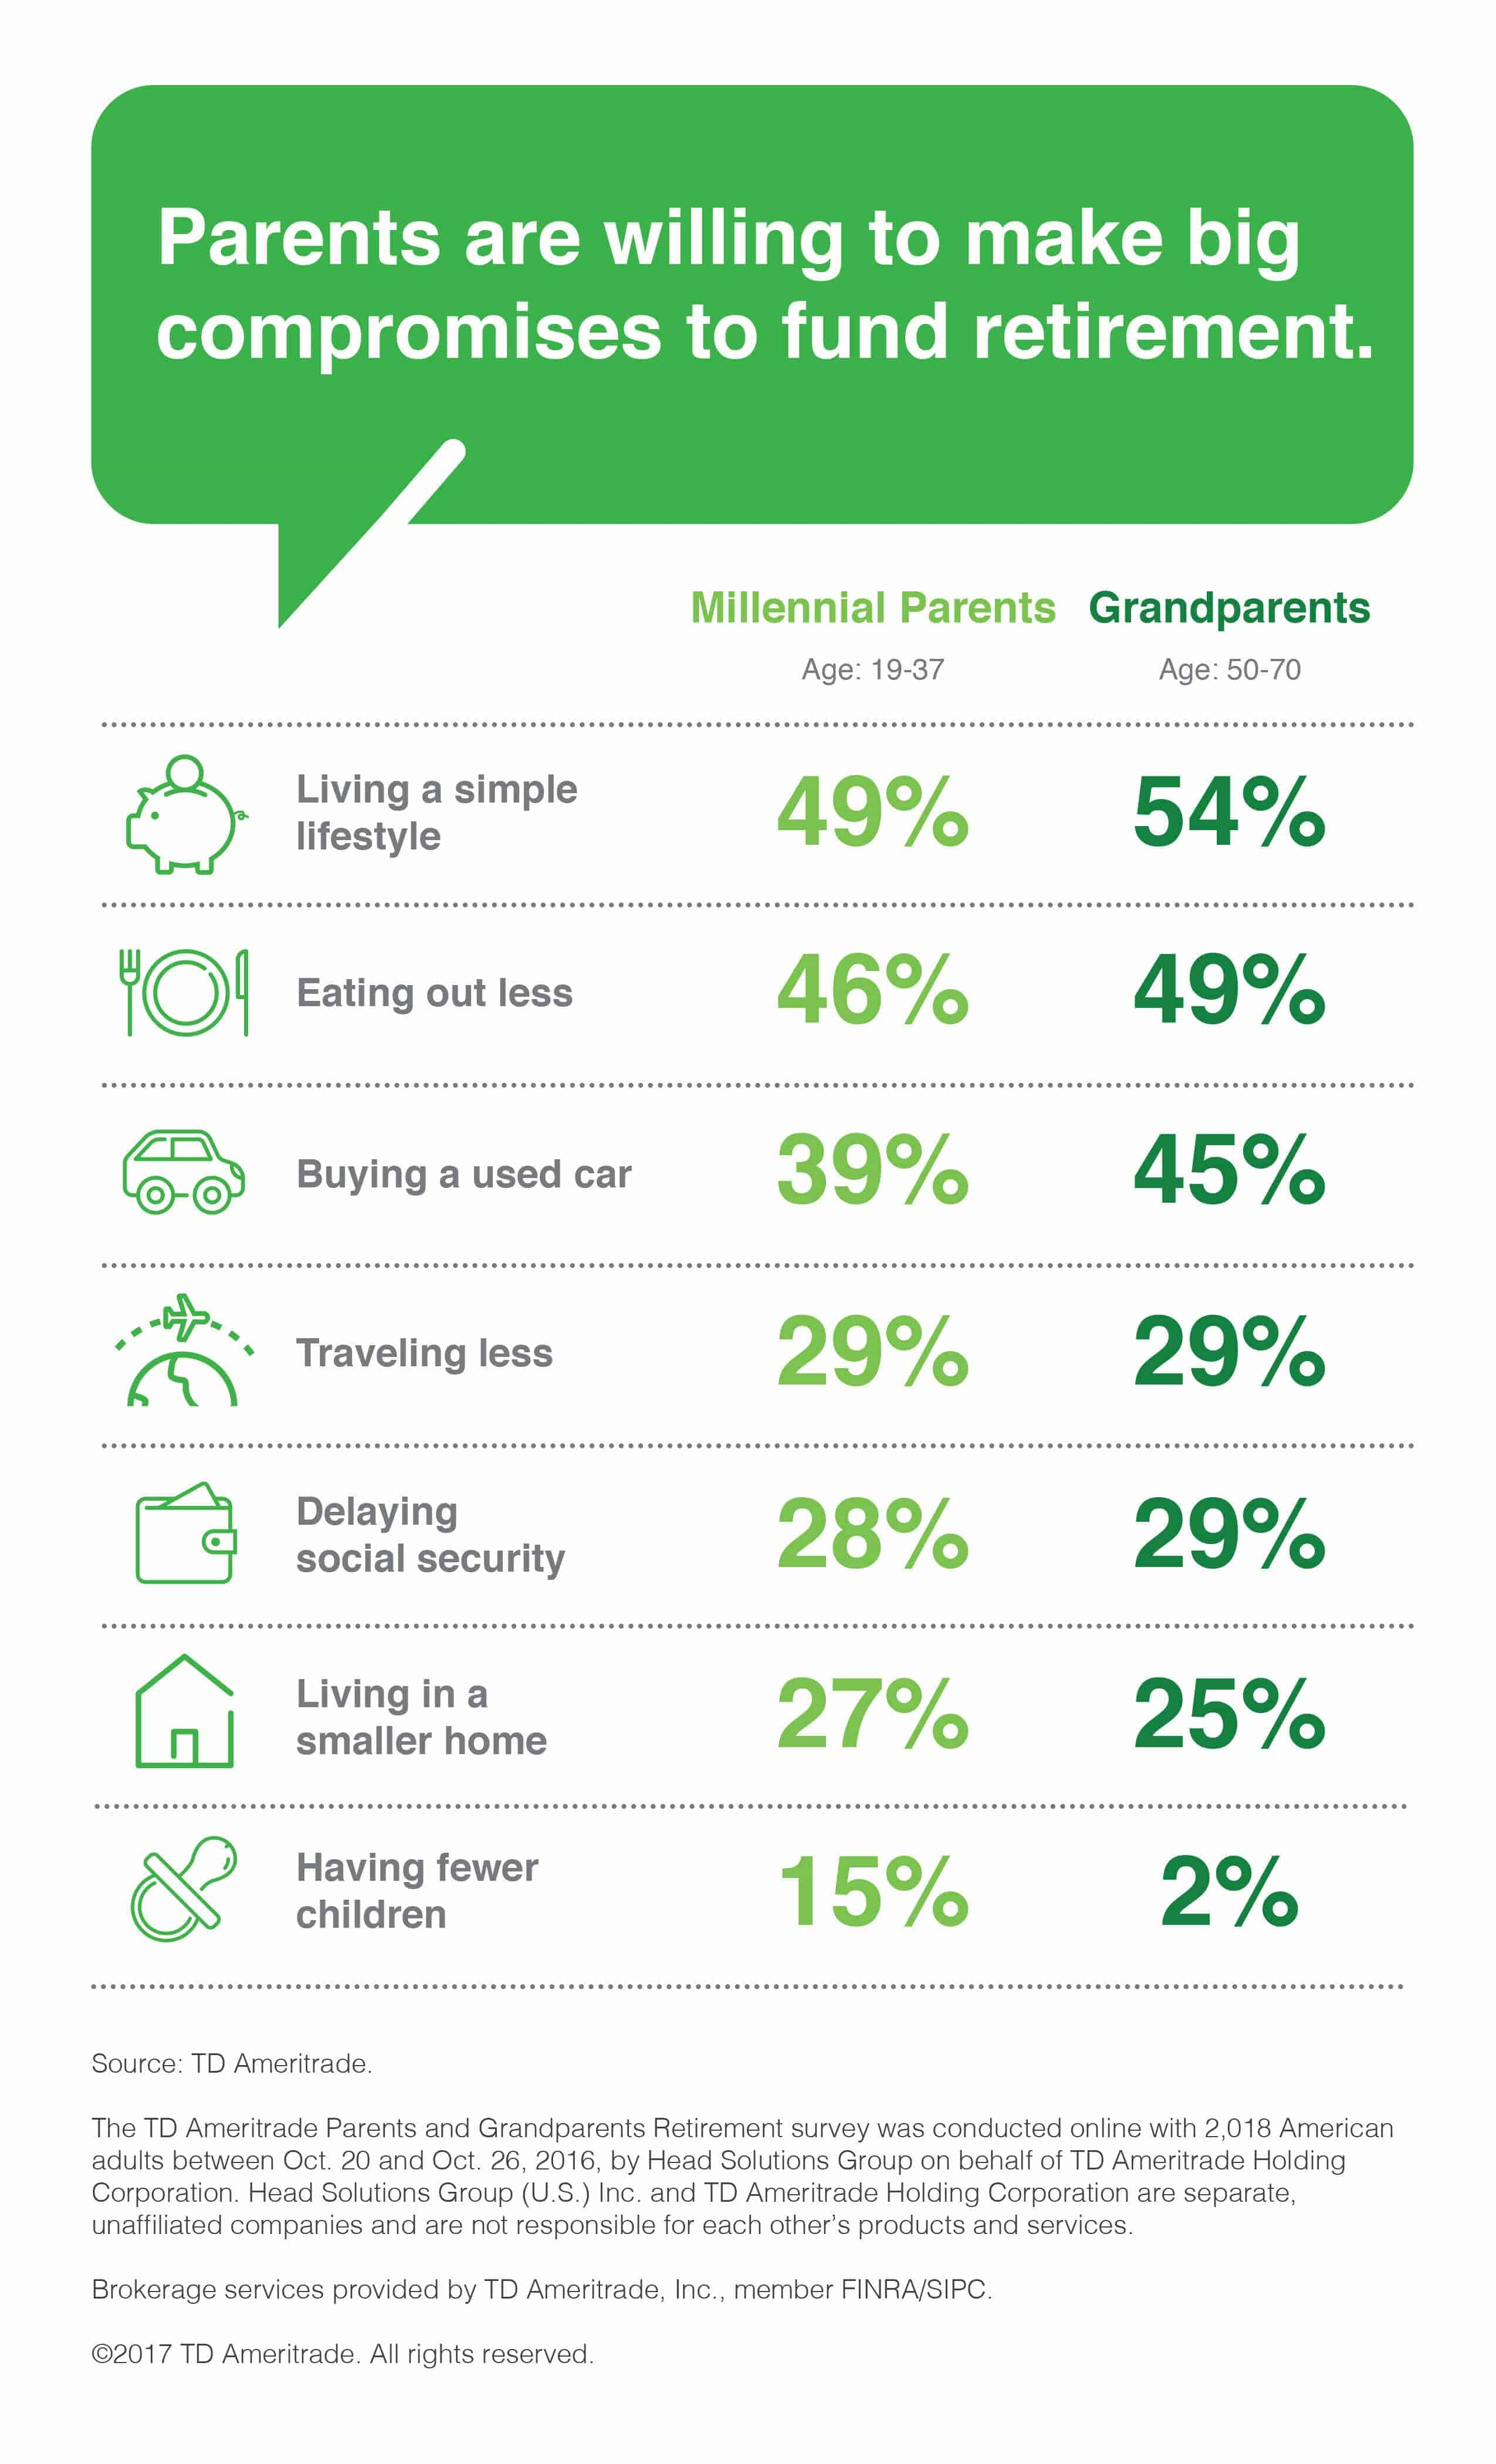 millennial parents downsize